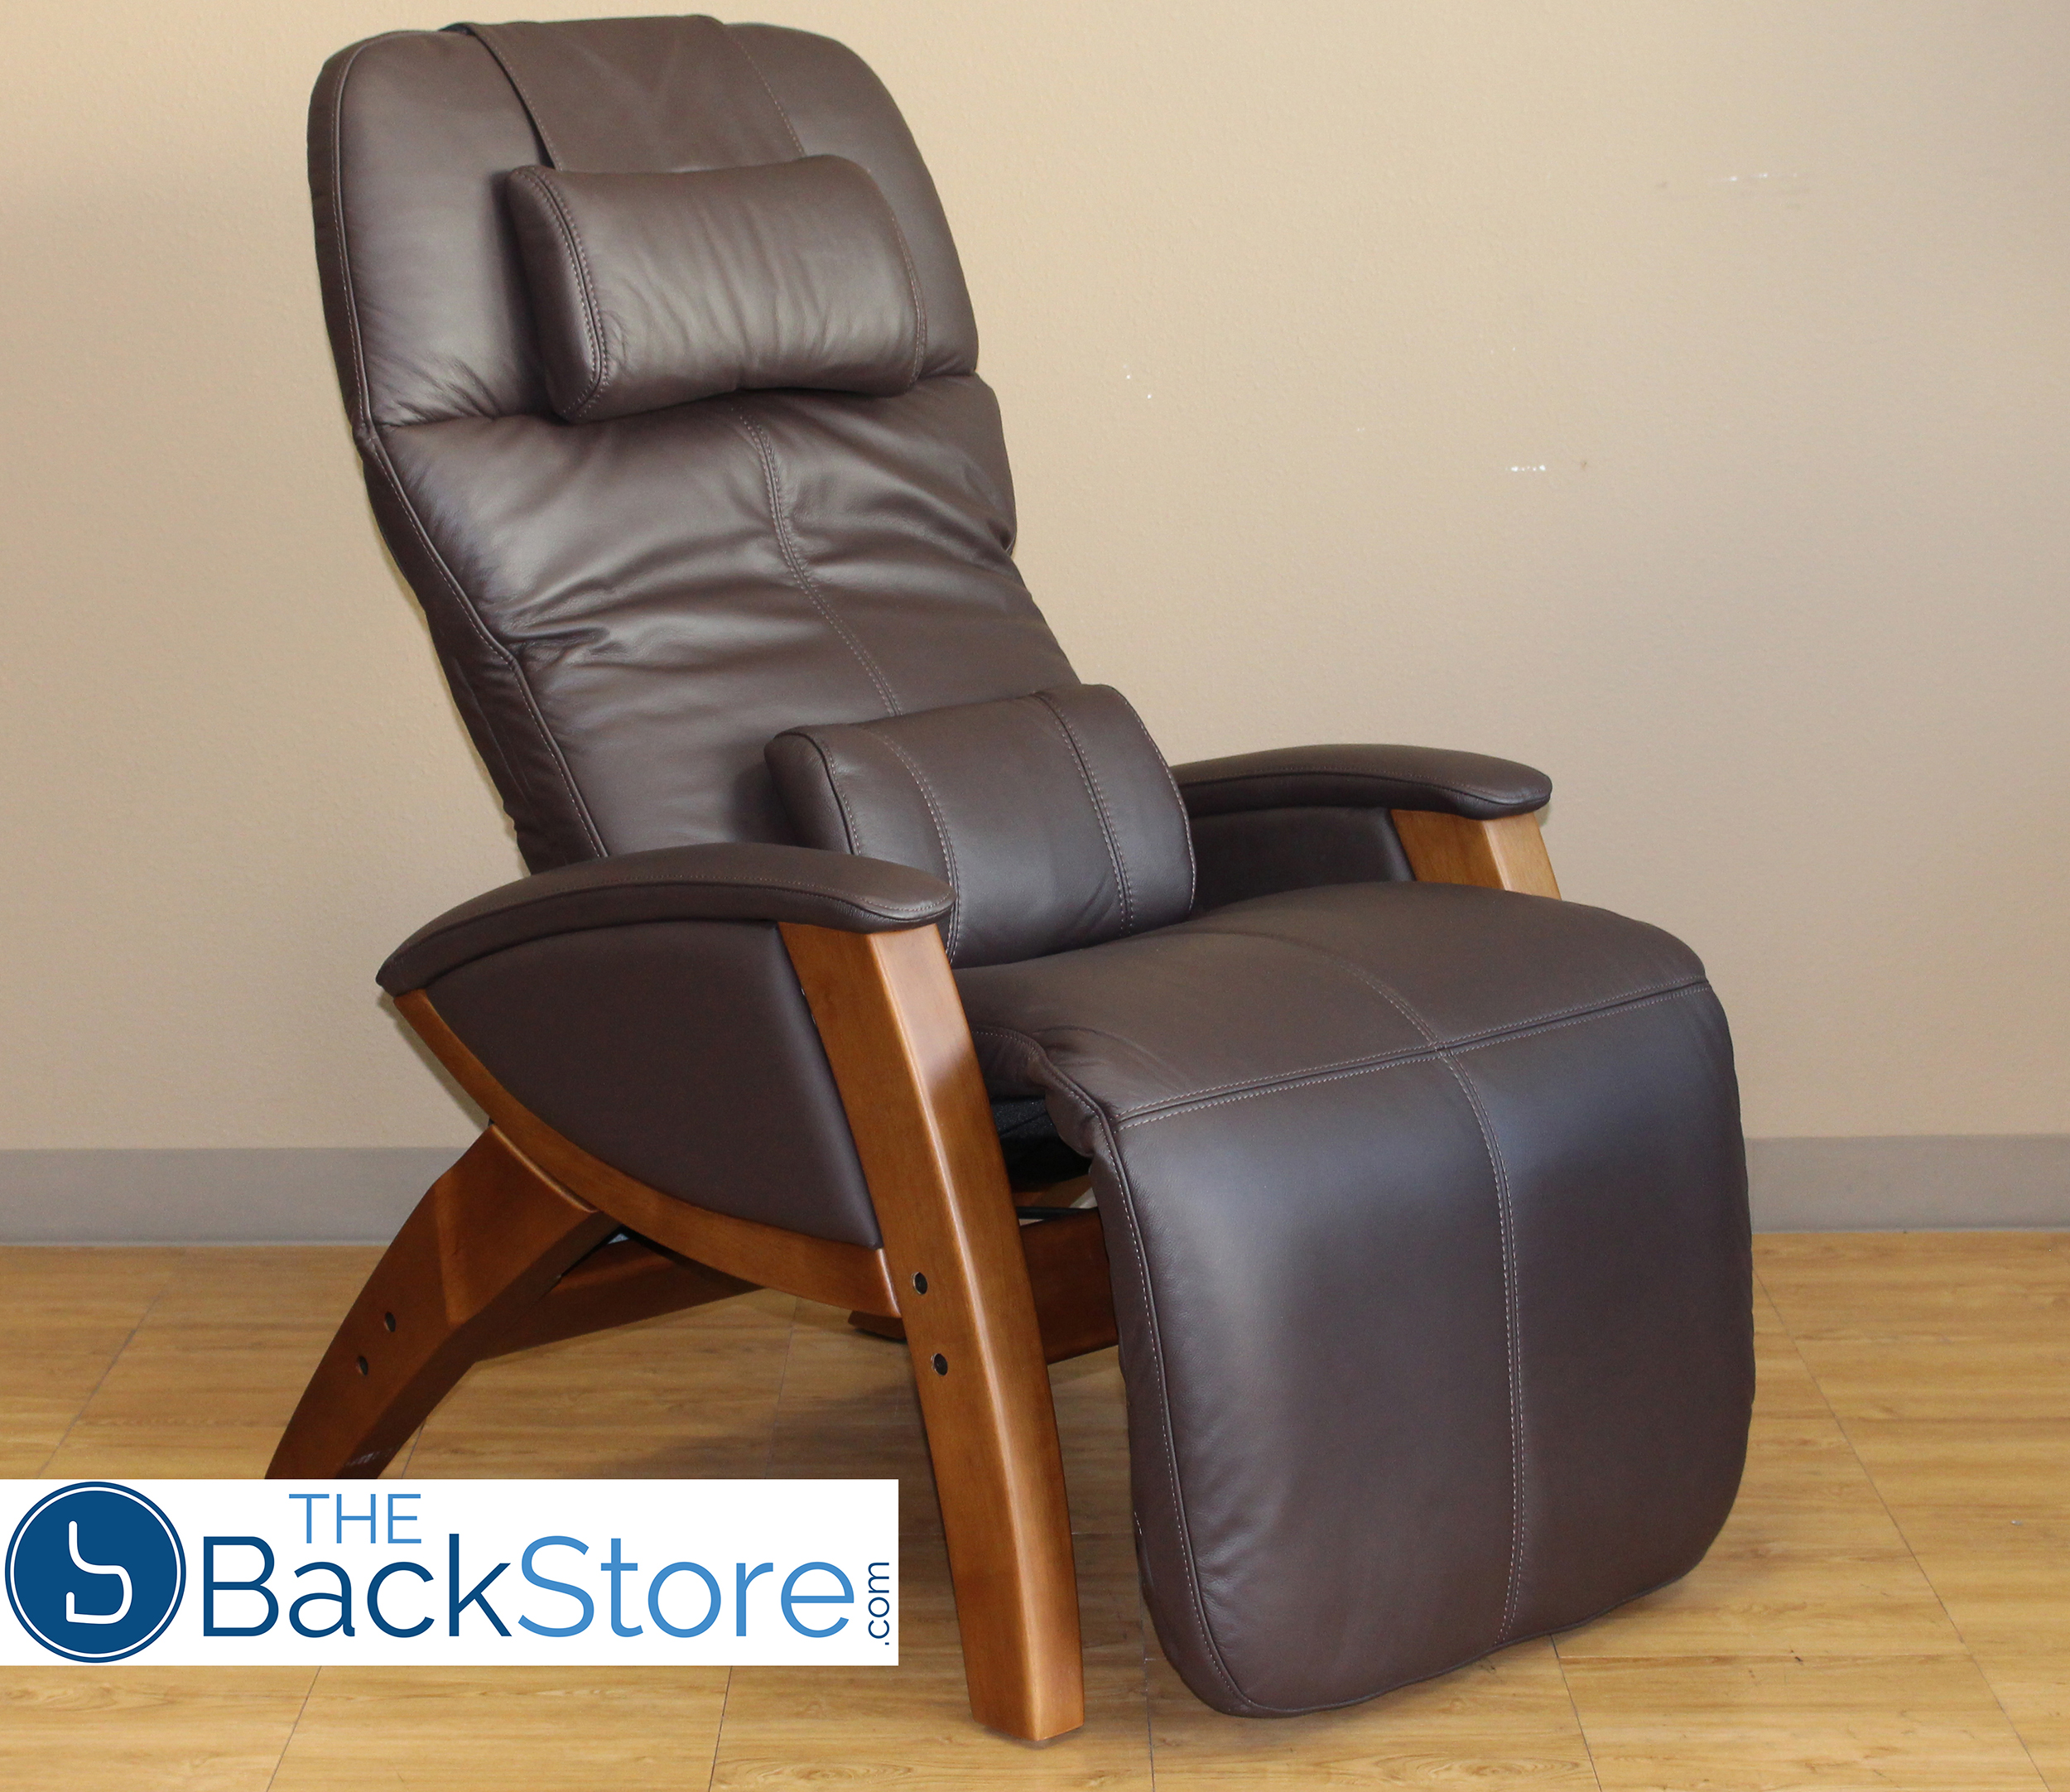 Svago Sv 400 Sv 405 Lusso Zero Anti Gravity Leather Recliner Massage Chair